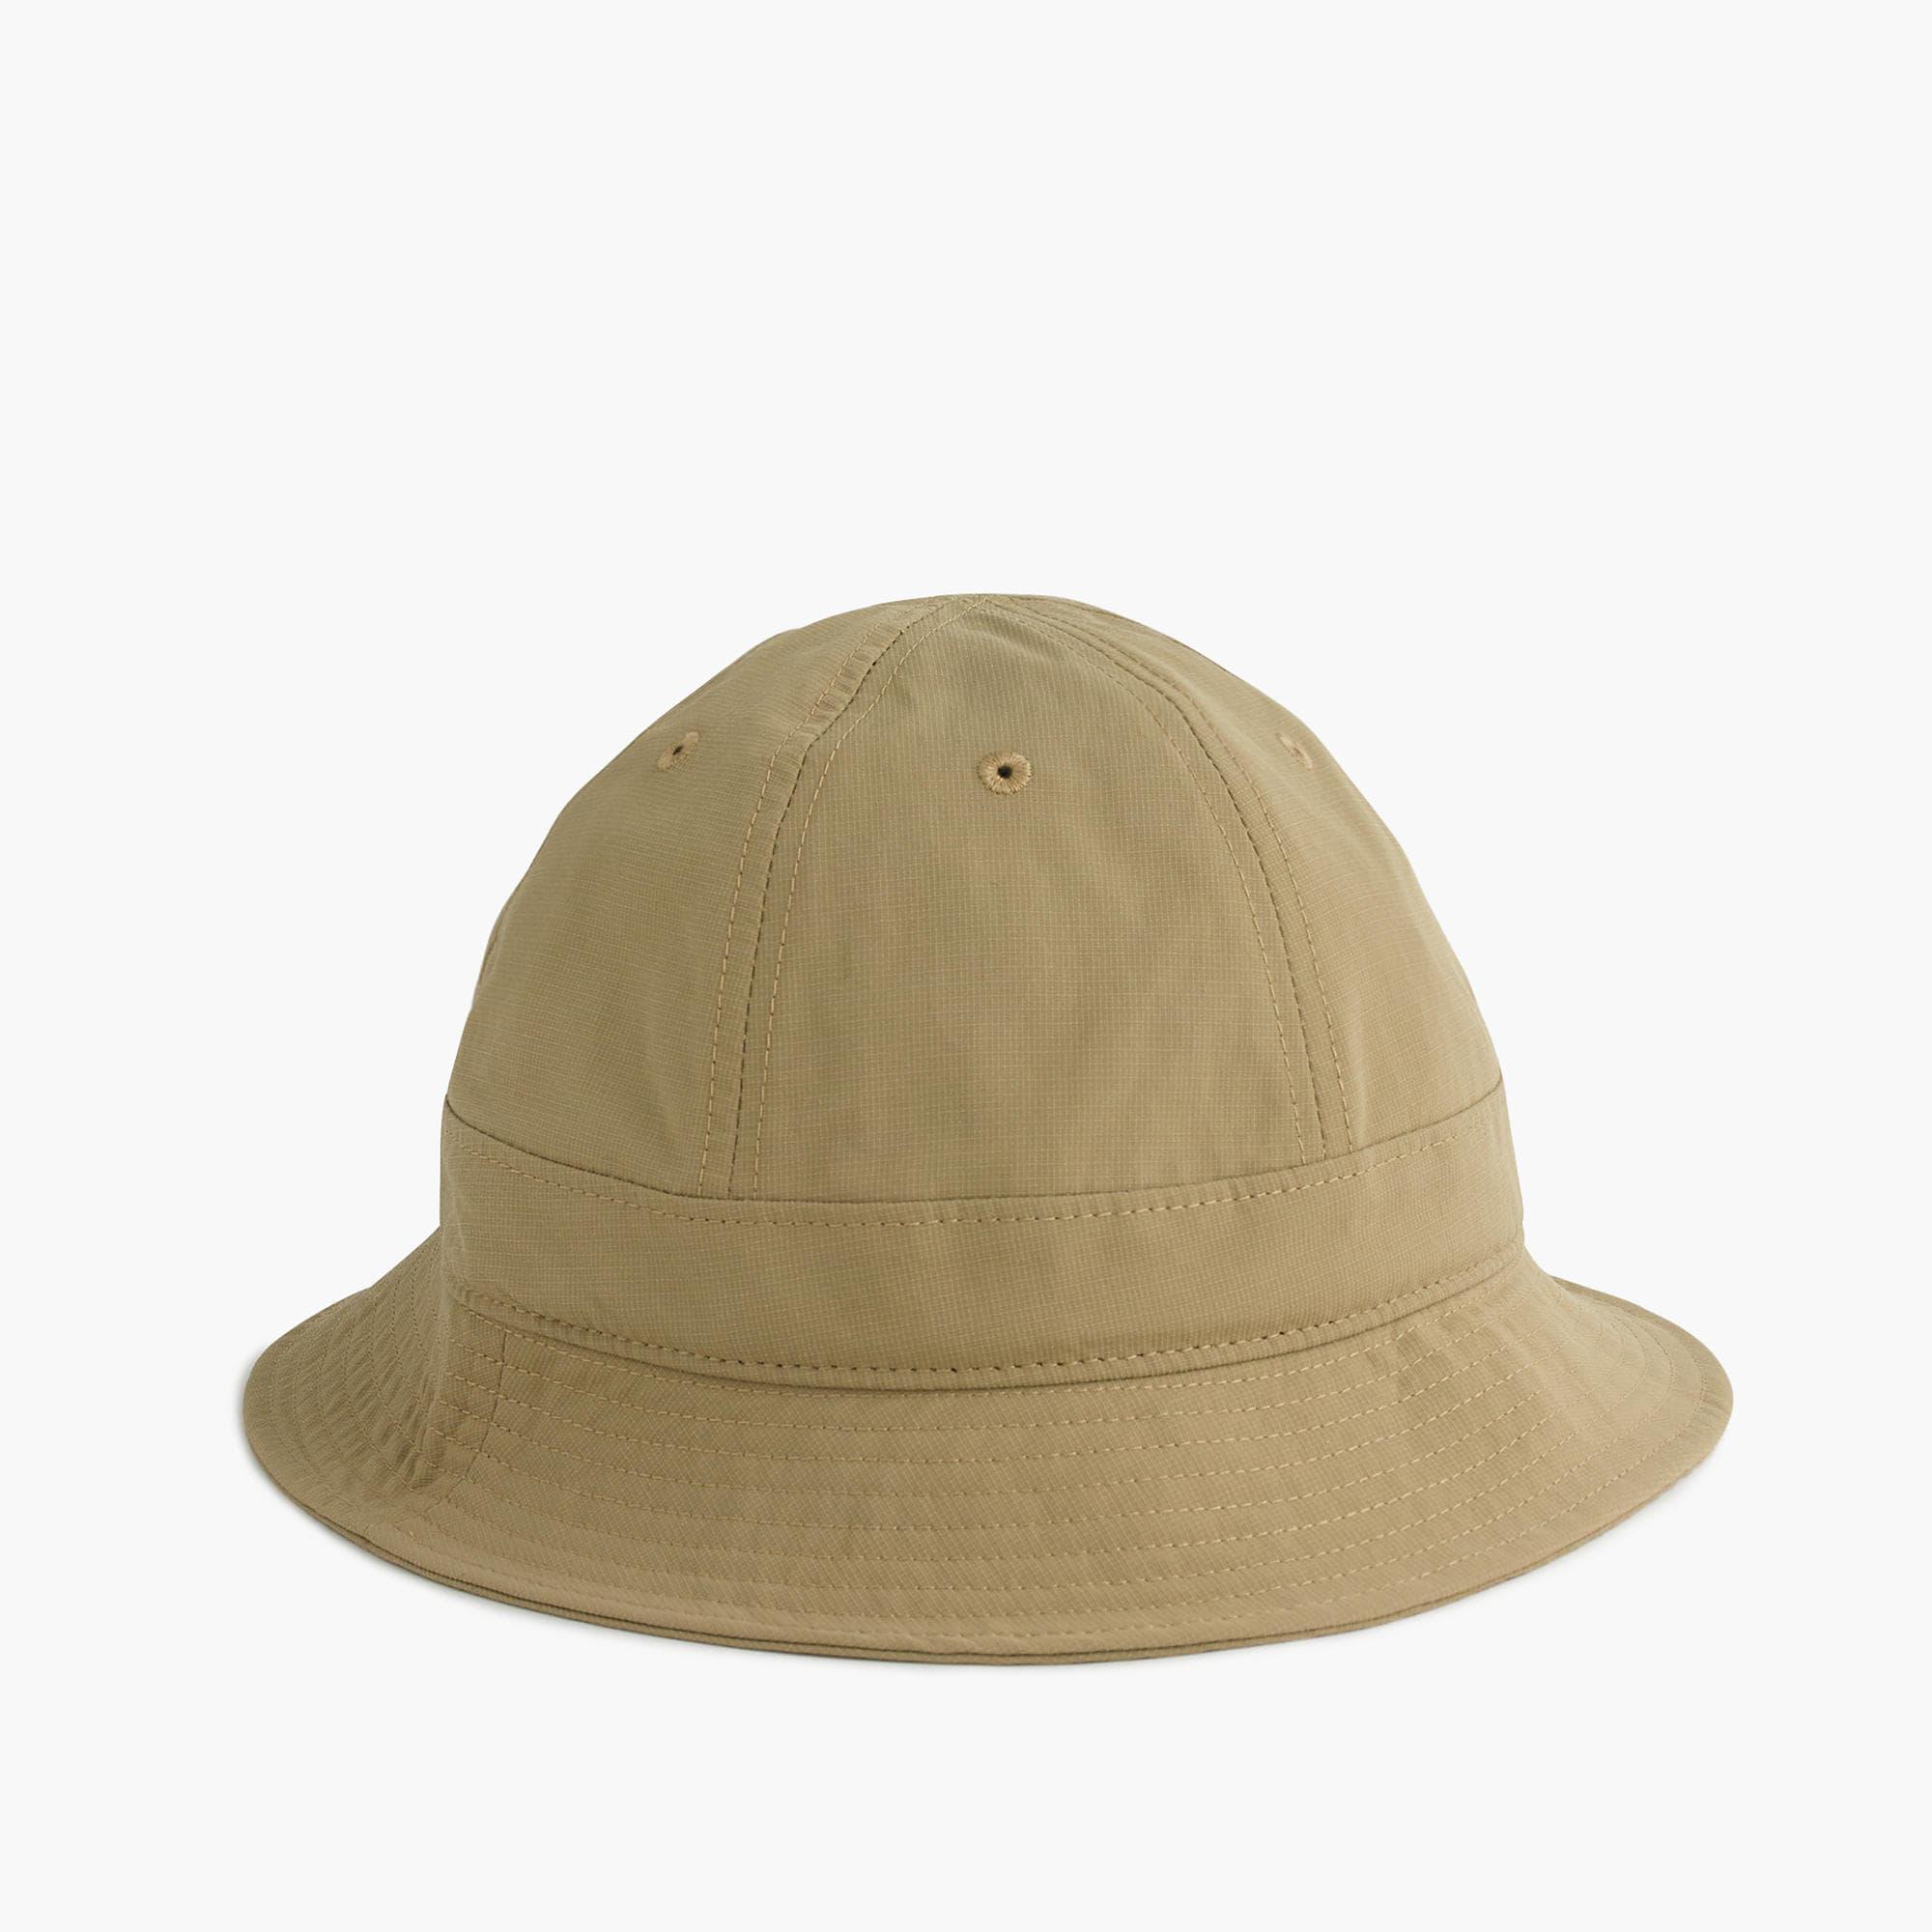 J.Crew Sun-safe Bucket Hat in Natural - Lyst 520e9bea22ac